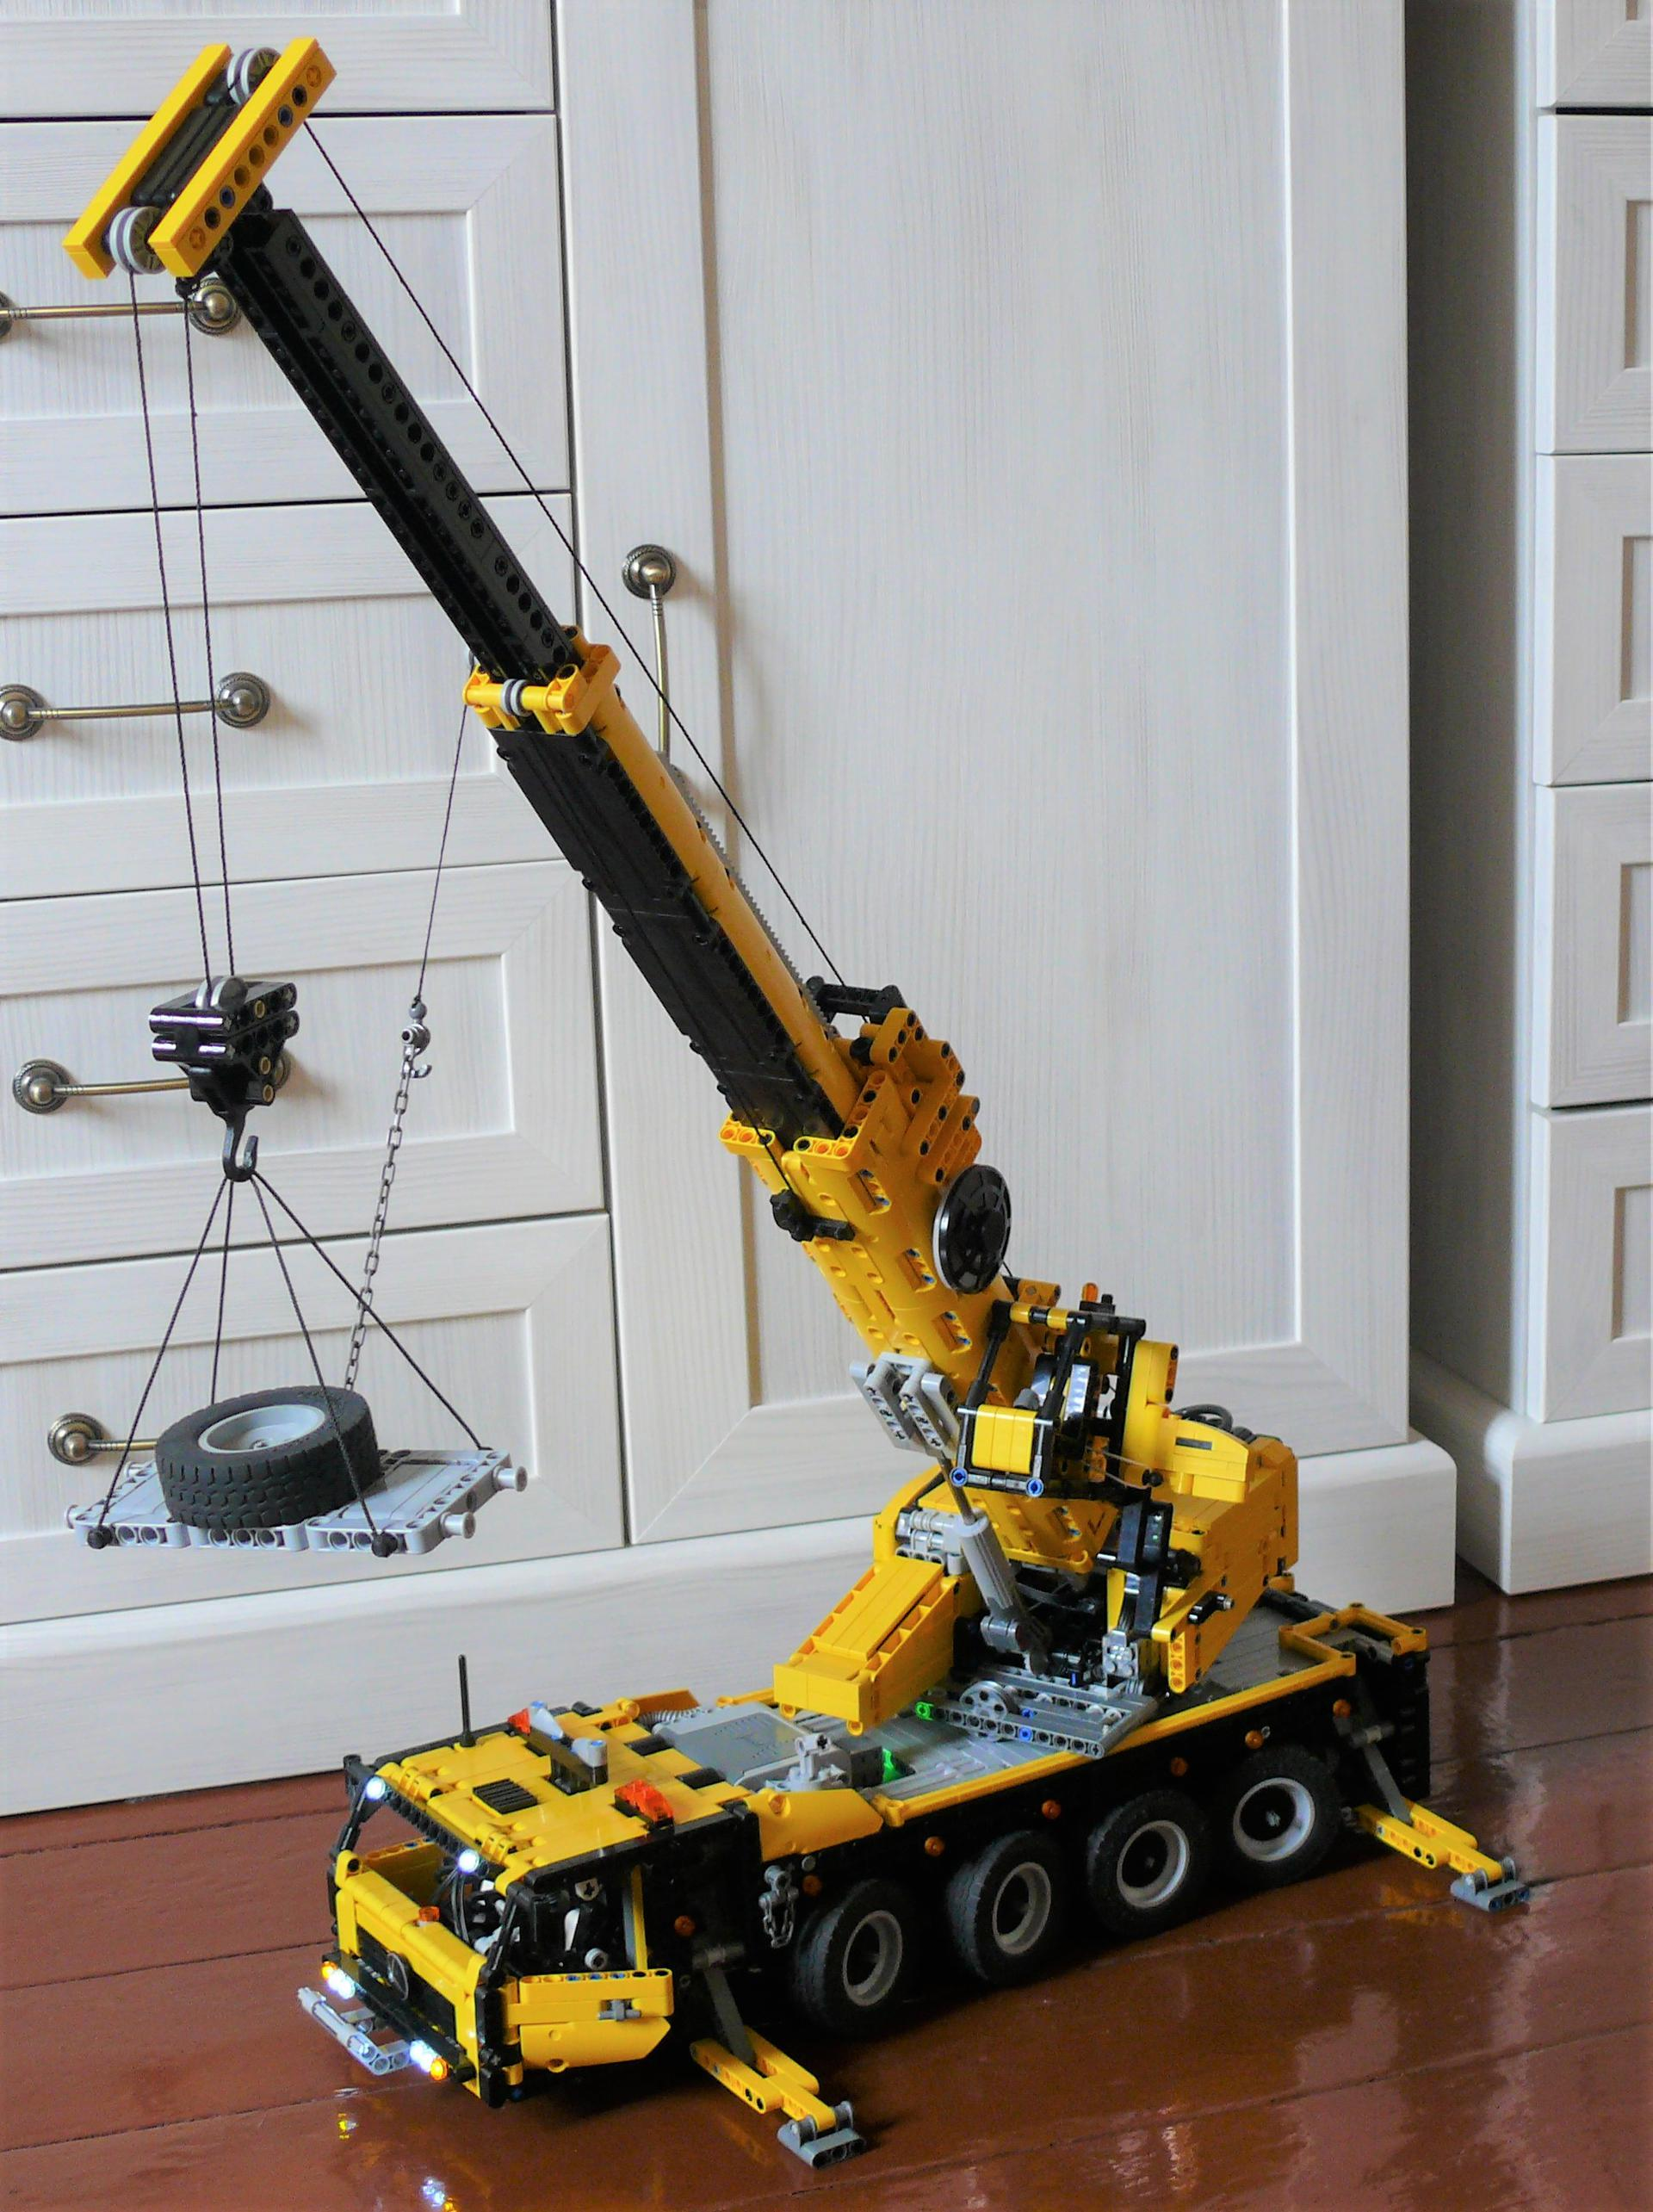 Mobile Crane Axle Loads : Rc axle mobile crane bricksafe